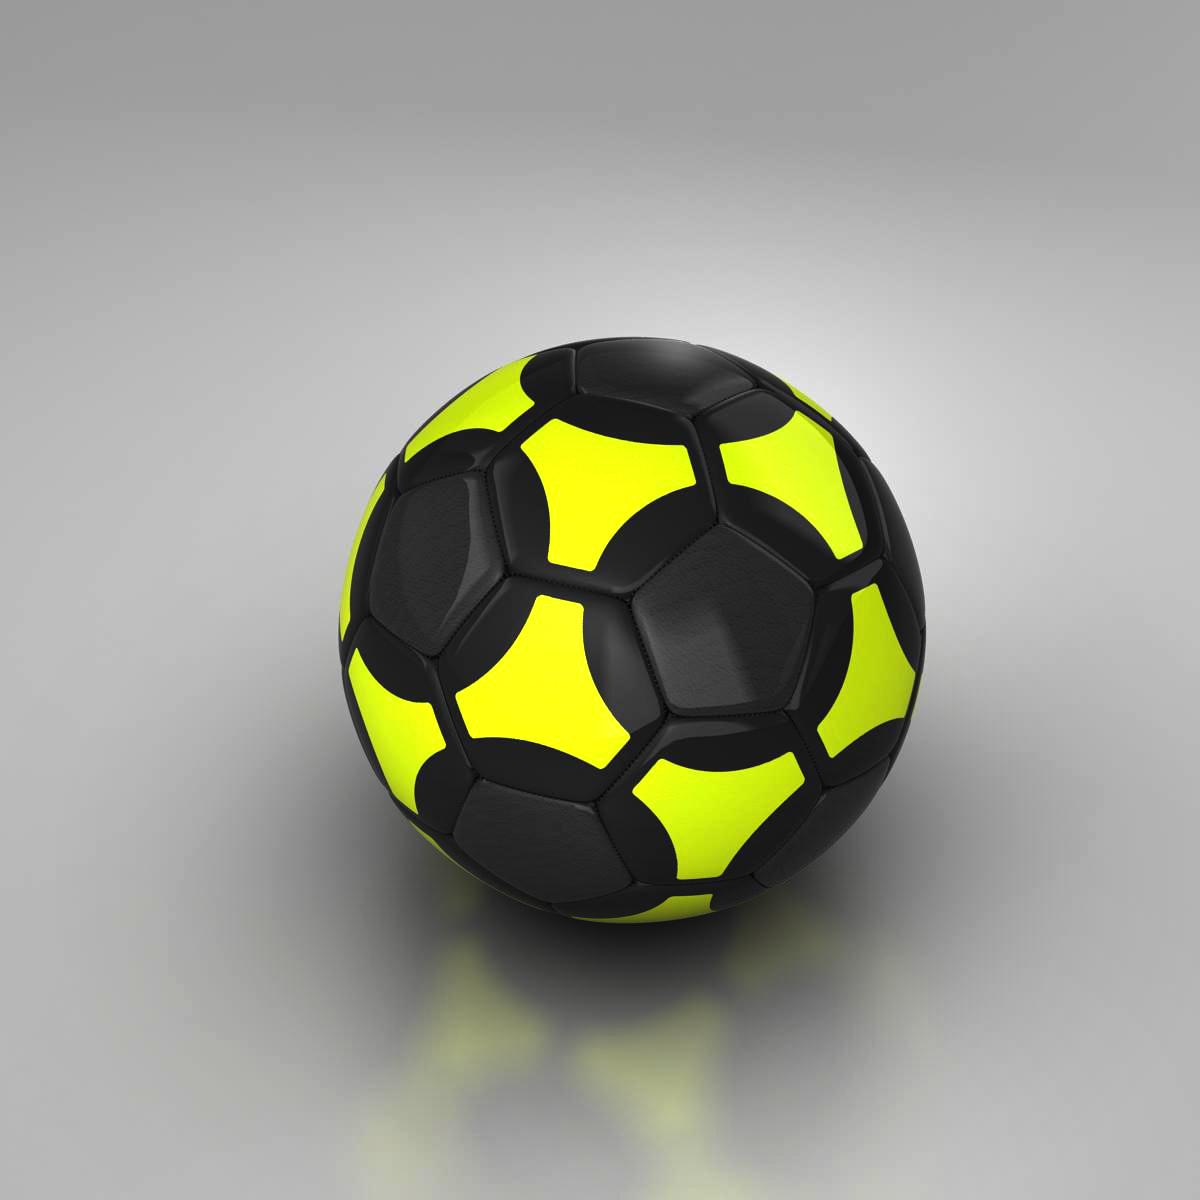 soccerball хар шар 3d загвар 3ds max fbx c4d ma mb obj 204207